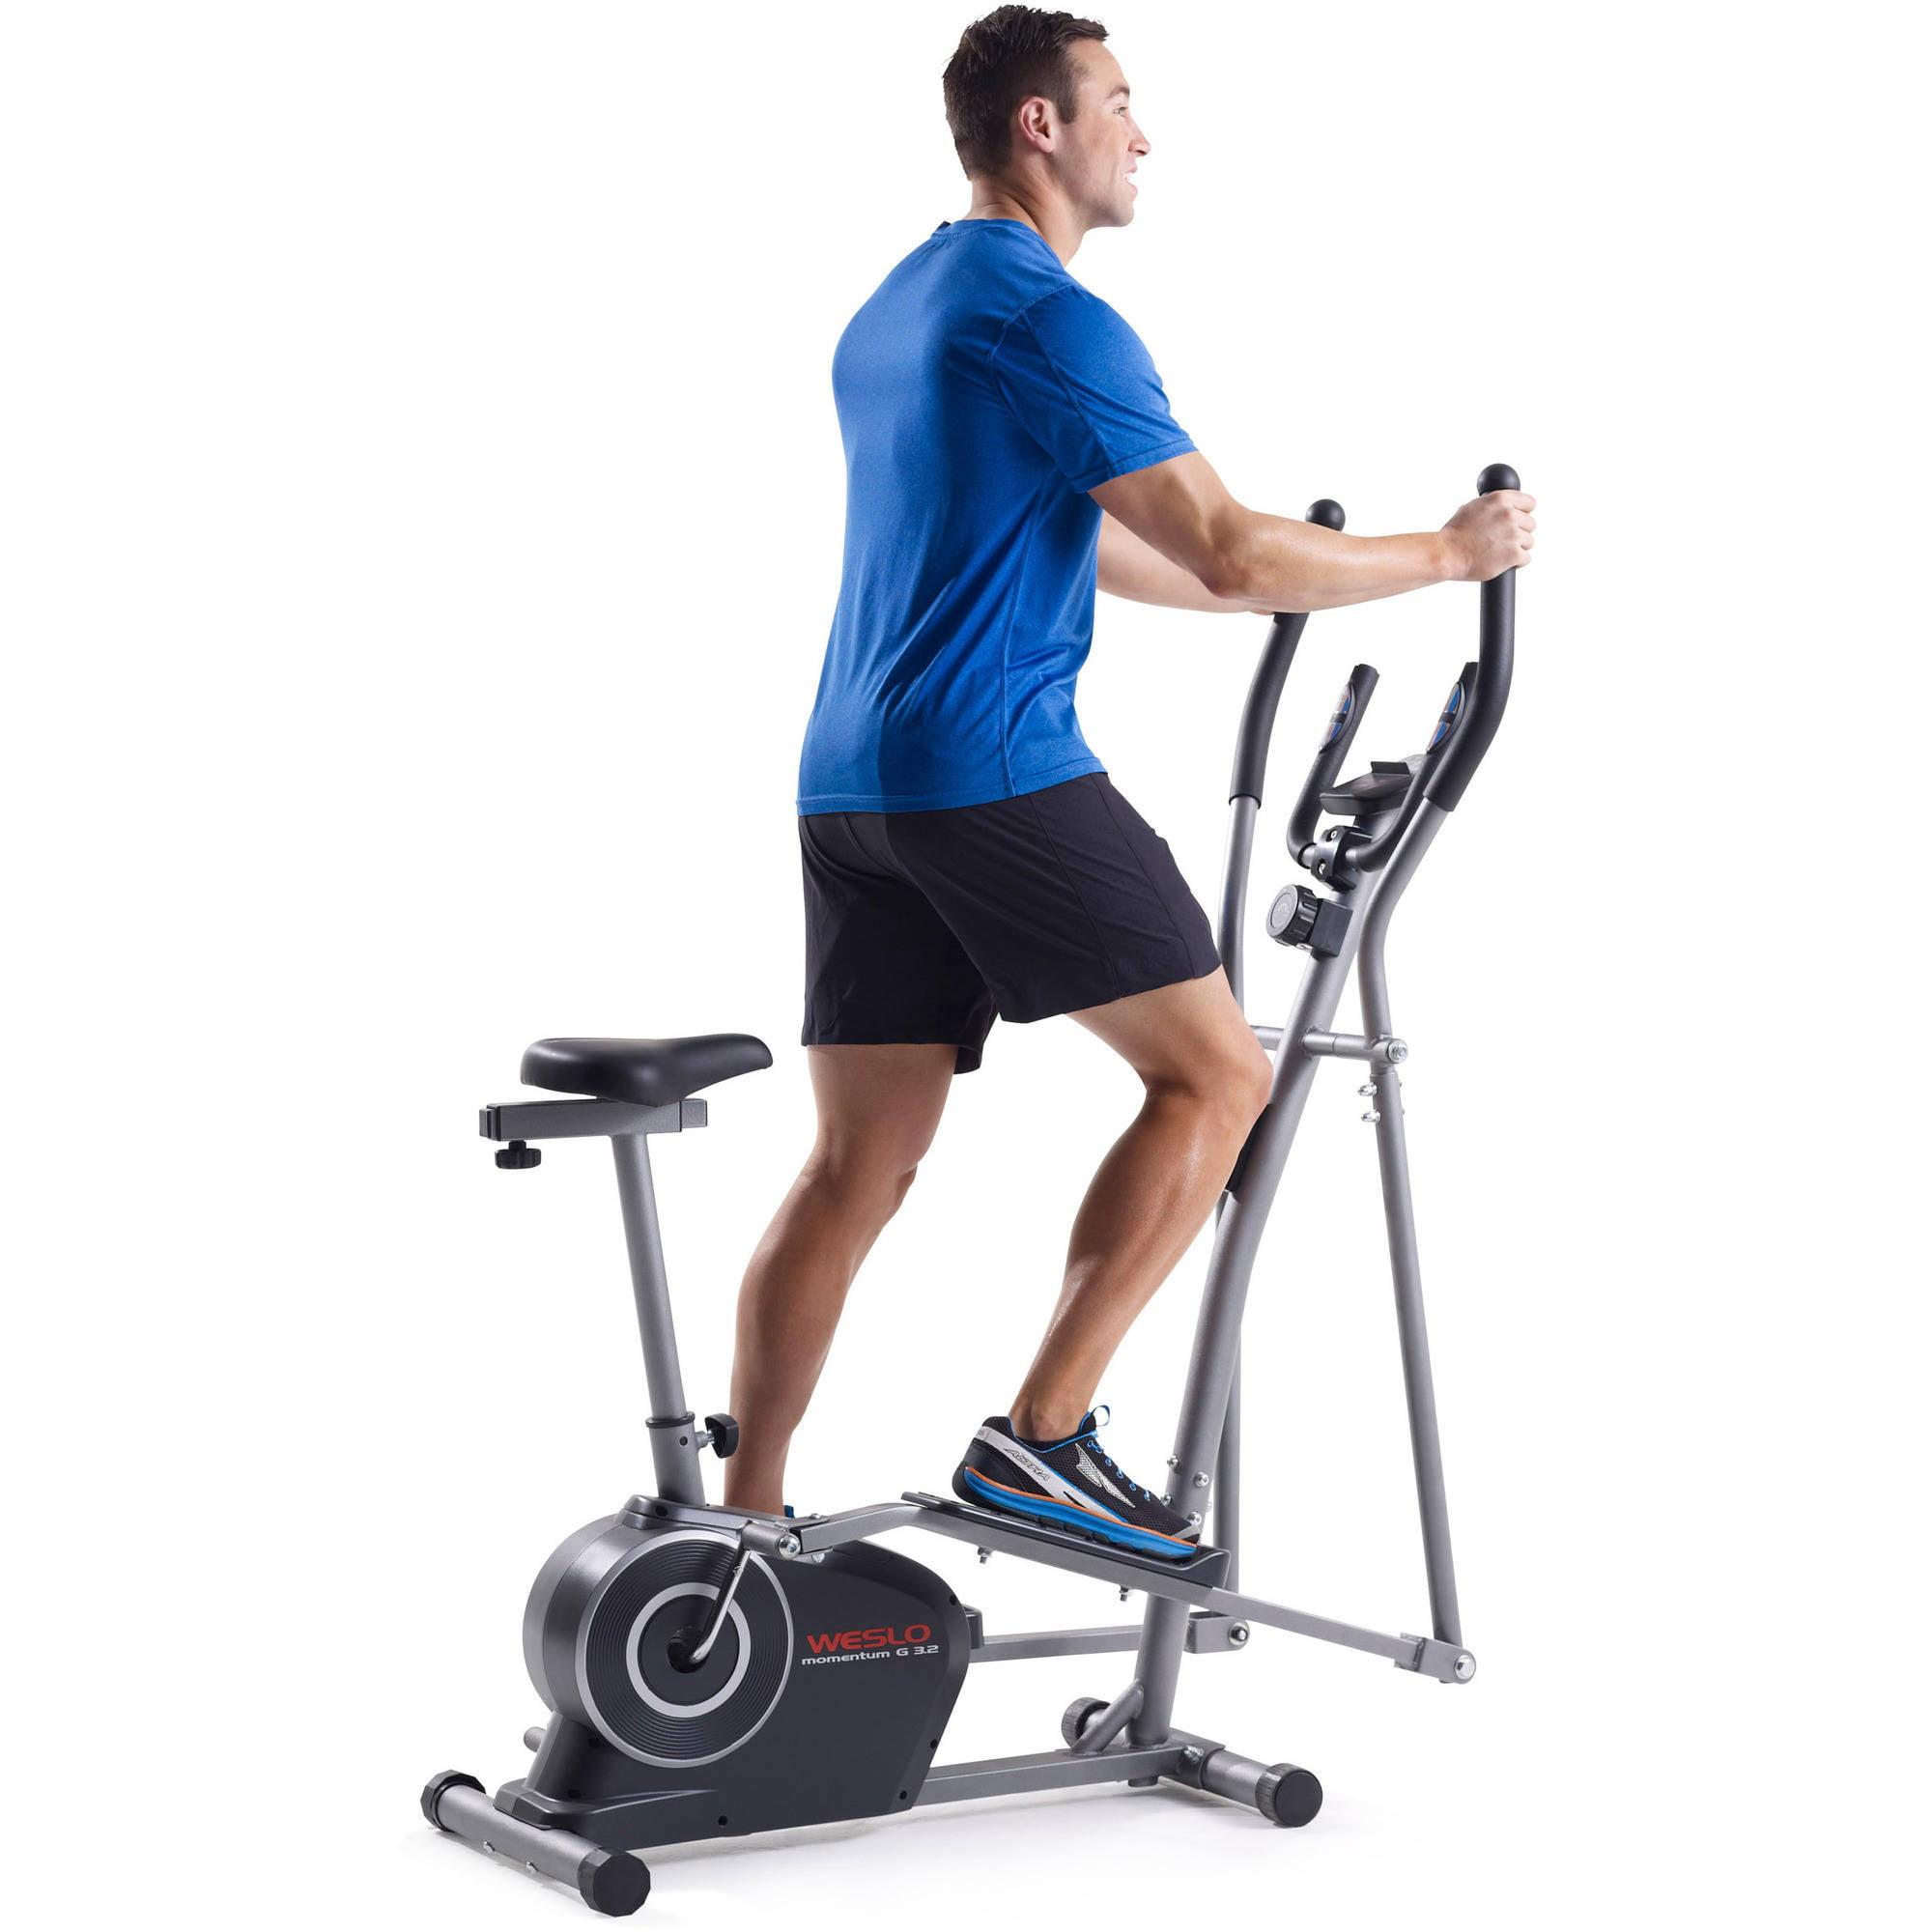 Elliptical Bike Trainer Exercise Fitness Workout Cardio